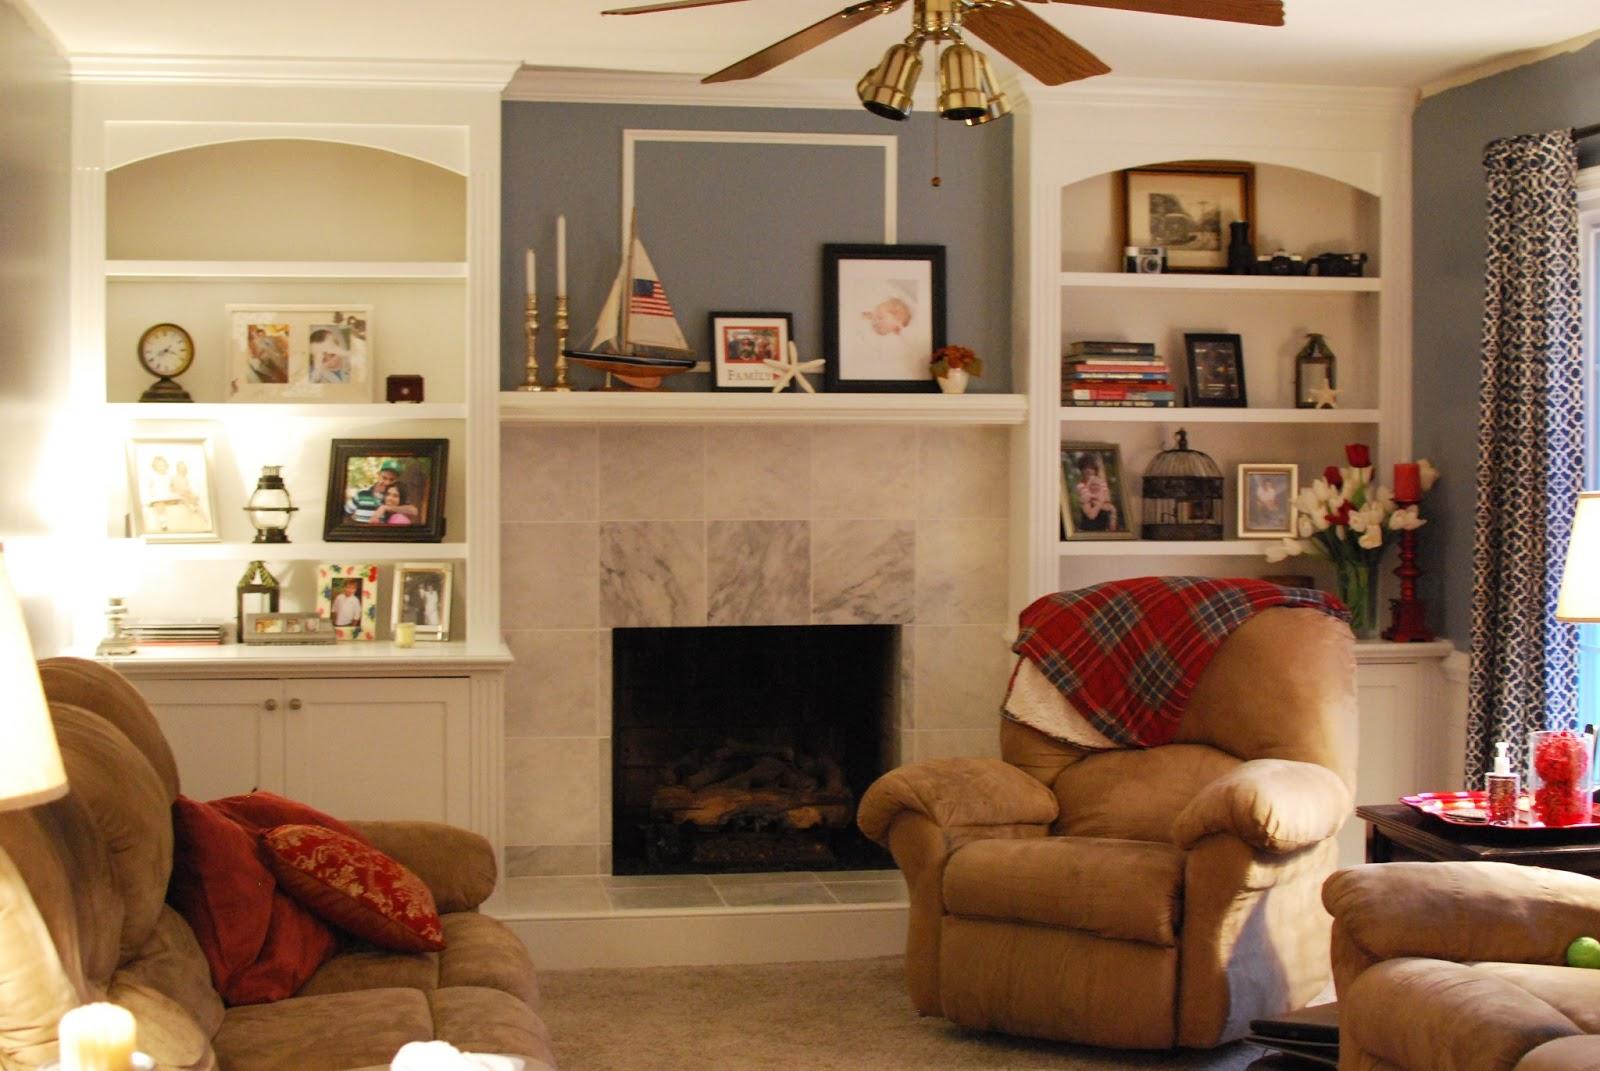 Red brick fireplace makeover home design inside - Red brick fireplace makeover ideas ...